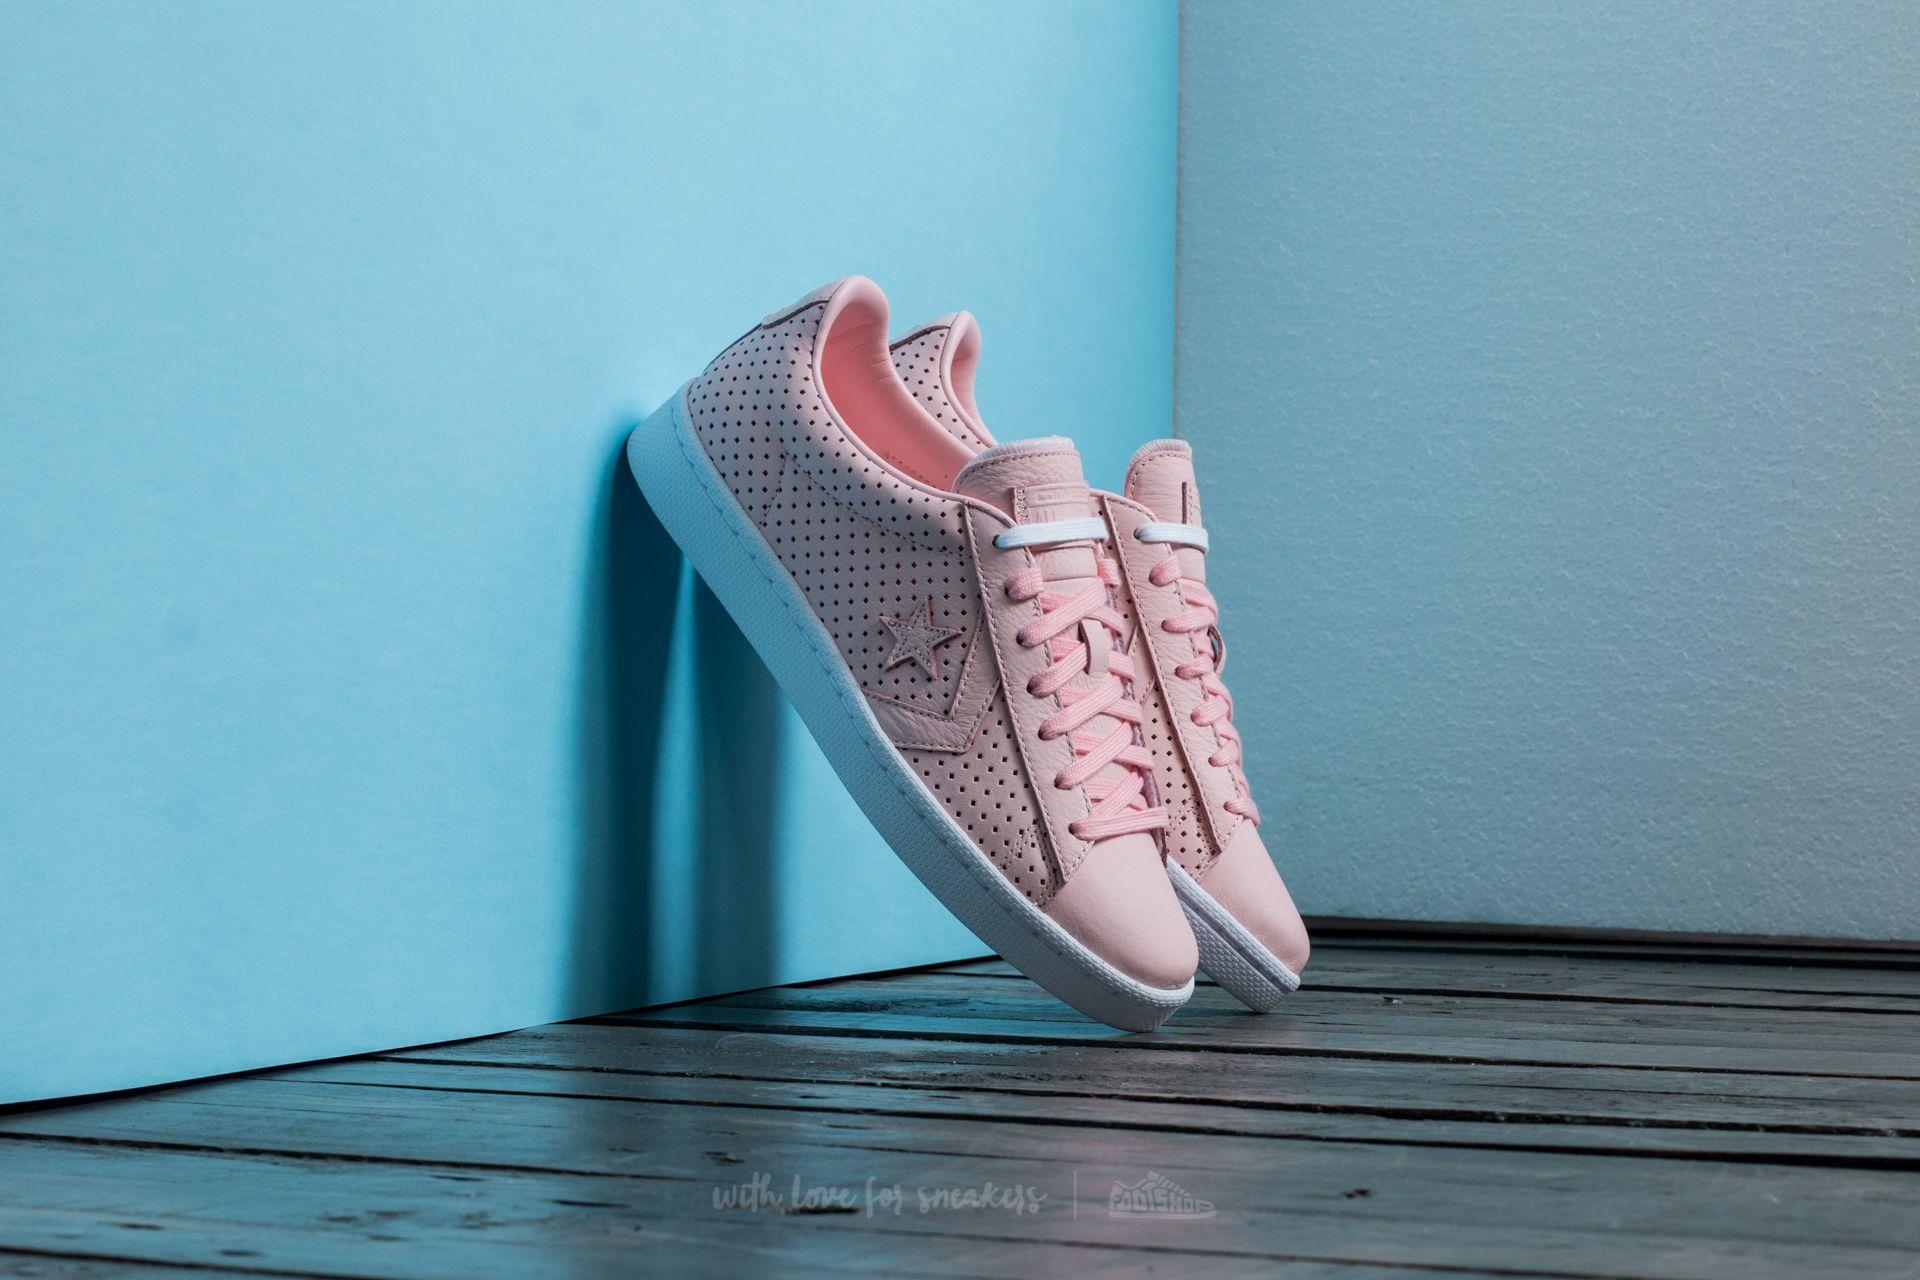 Converse Pro Leather 76 OX Vapor Pink/ Vapor Pink/ White